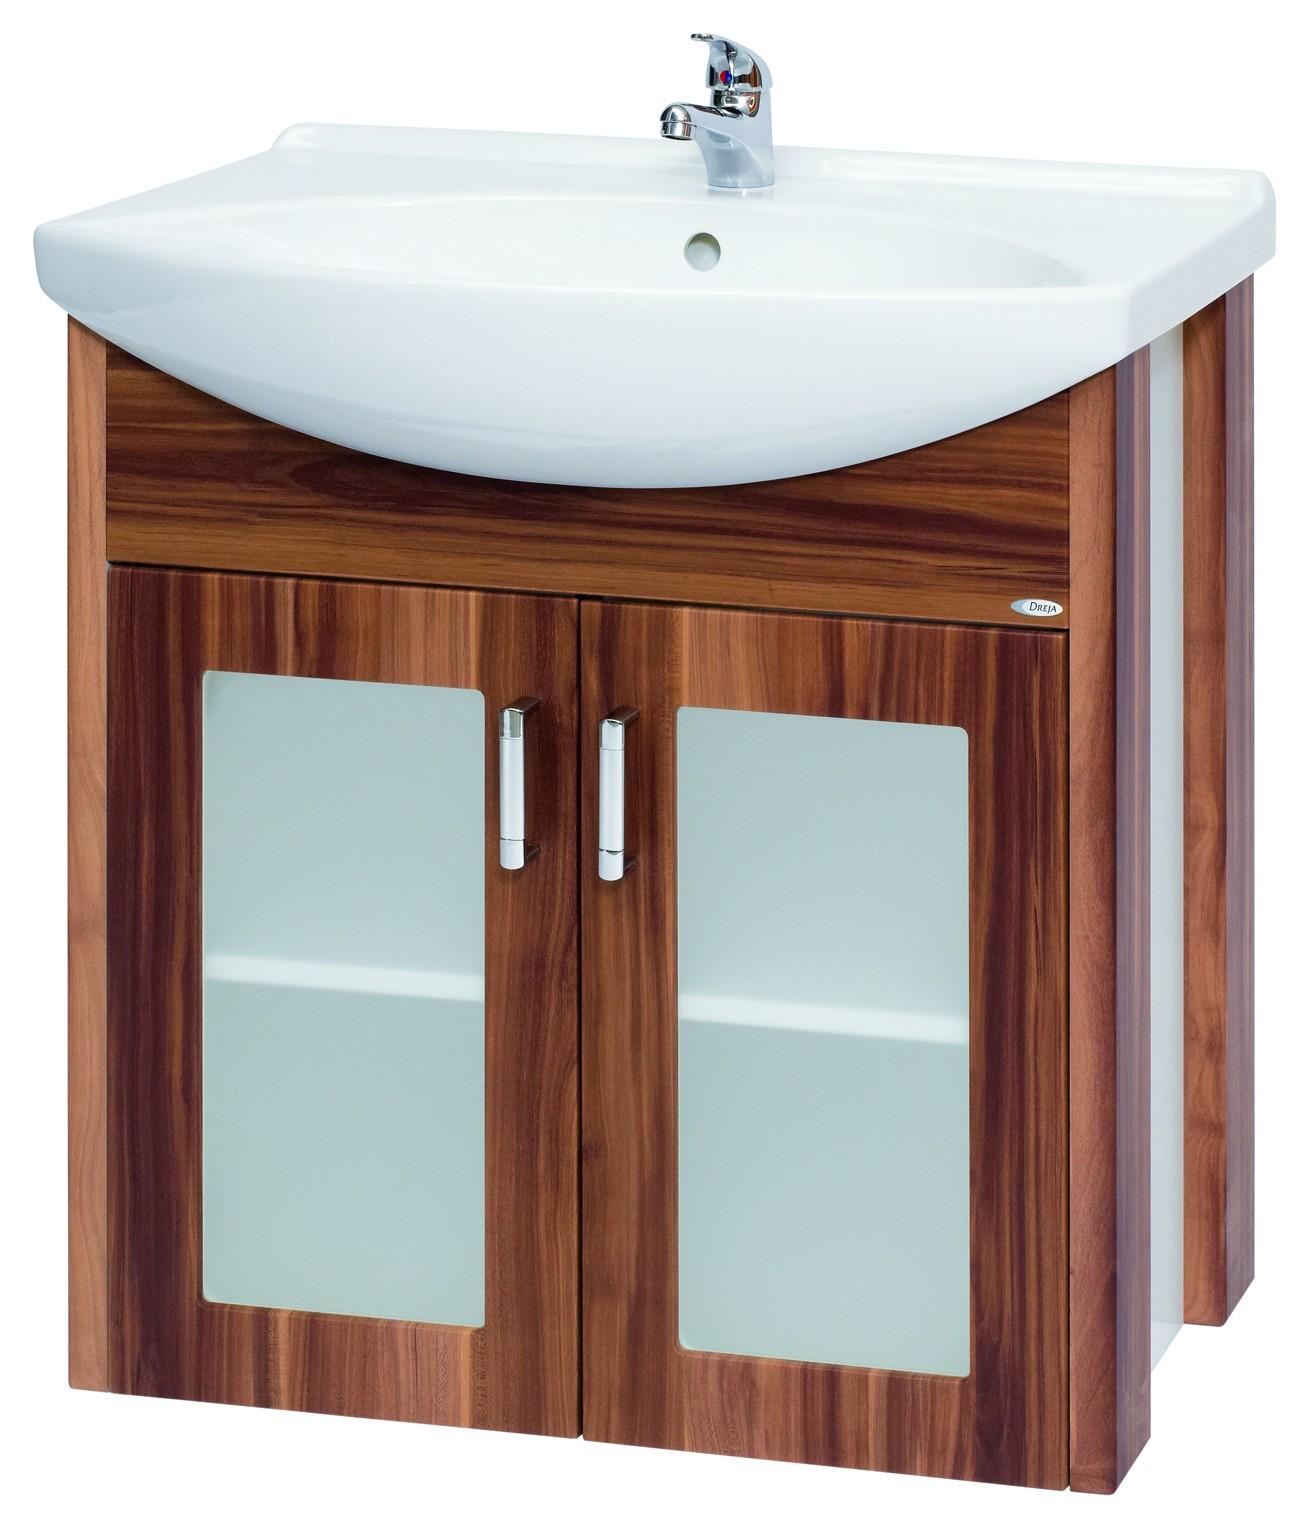 Тумба под раковину DrejaМебель для ванной комнаты<br>Тип: тумба,<br>Тип установки мебели для ванной: под раковину,<br>Материал изготовления мебели для ванной: дсп,<br>Цвет мебели для ванной: цвета под дерево<br>